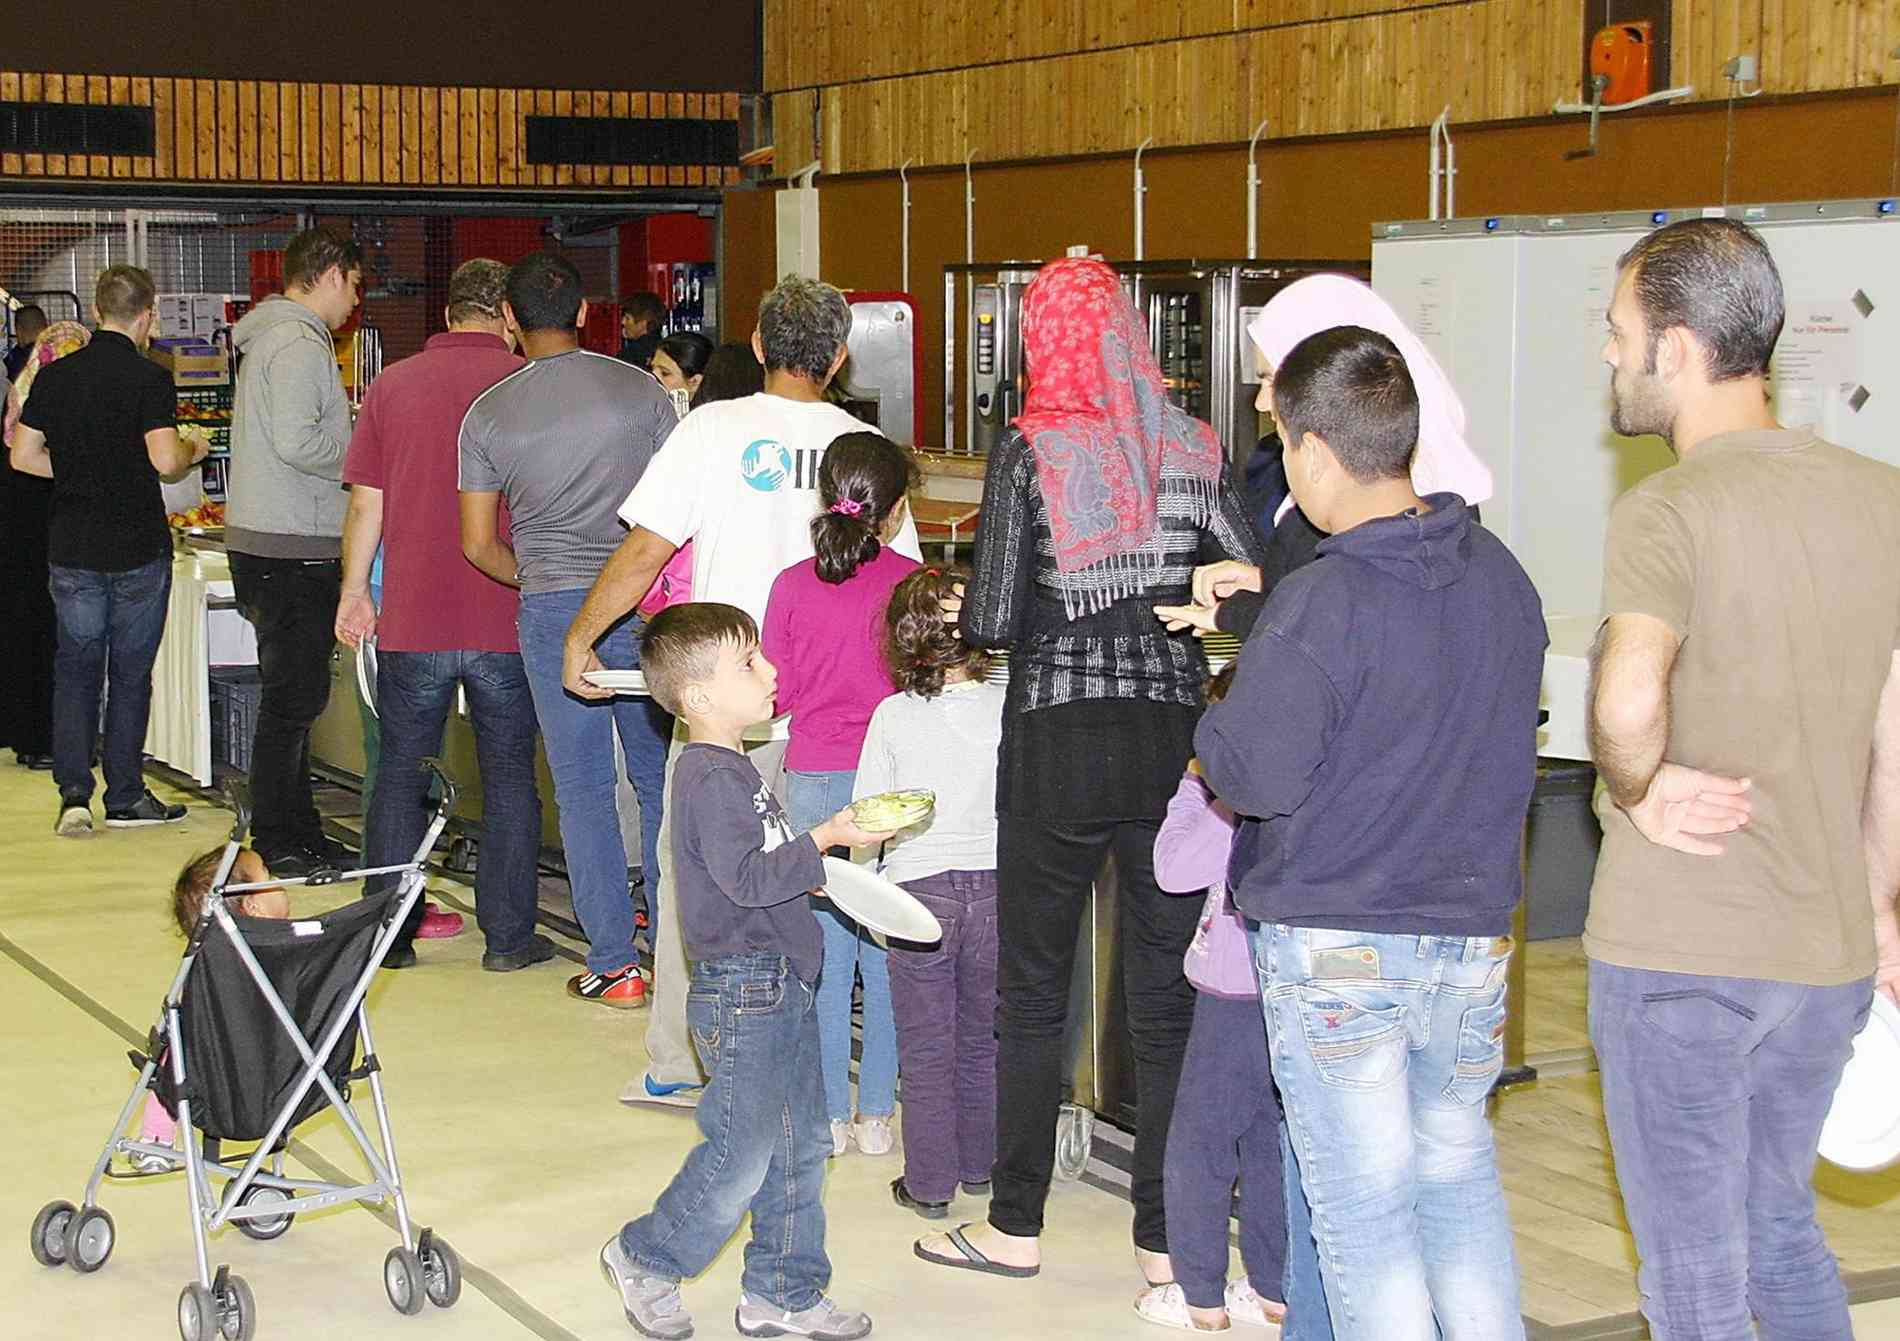 Unterbringung Flüchtlinge Köln